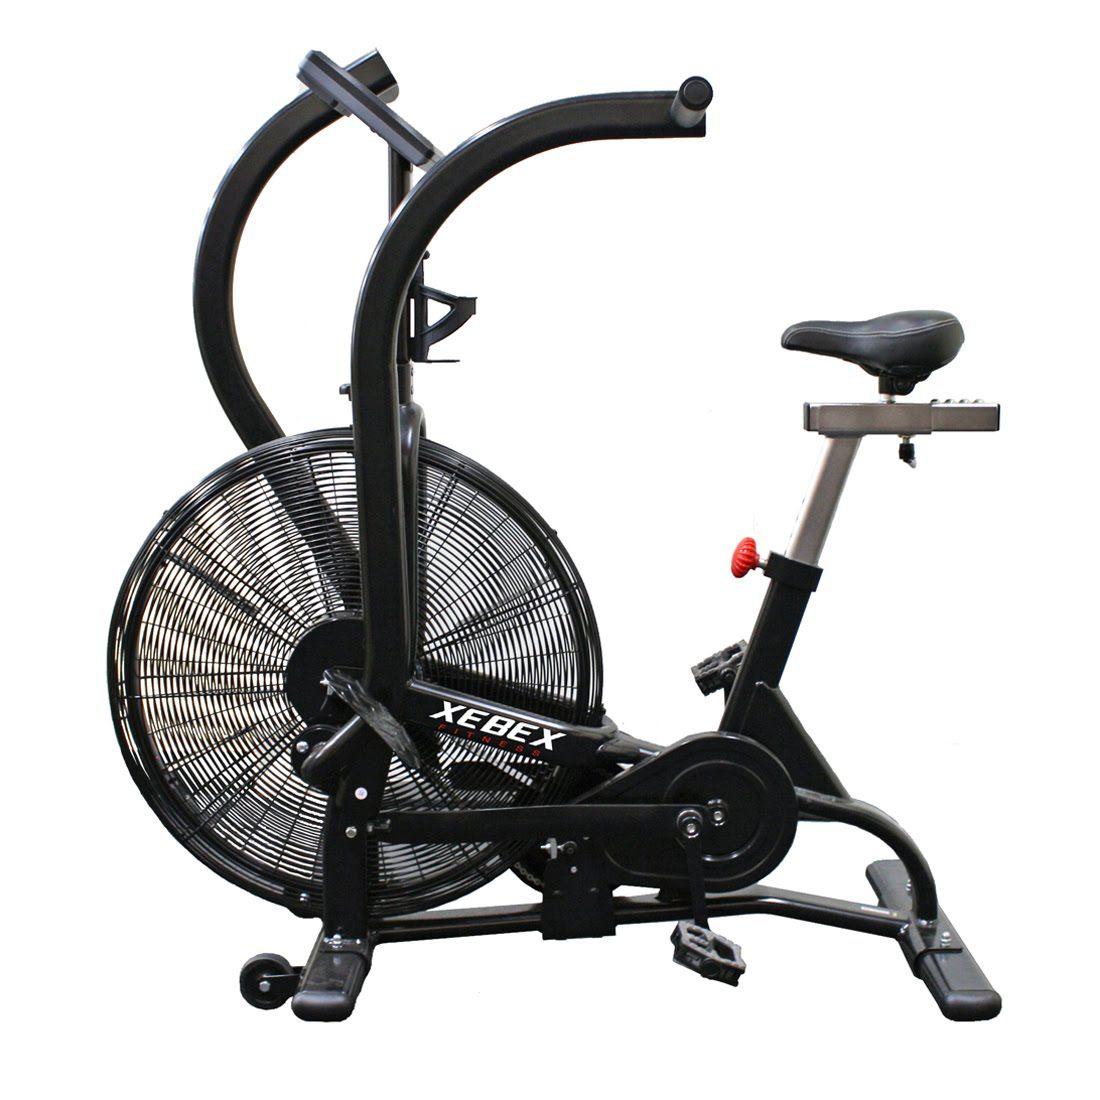 Xebex Commercial Air Bike Commercial Gym Equipment Bike Garage Gym